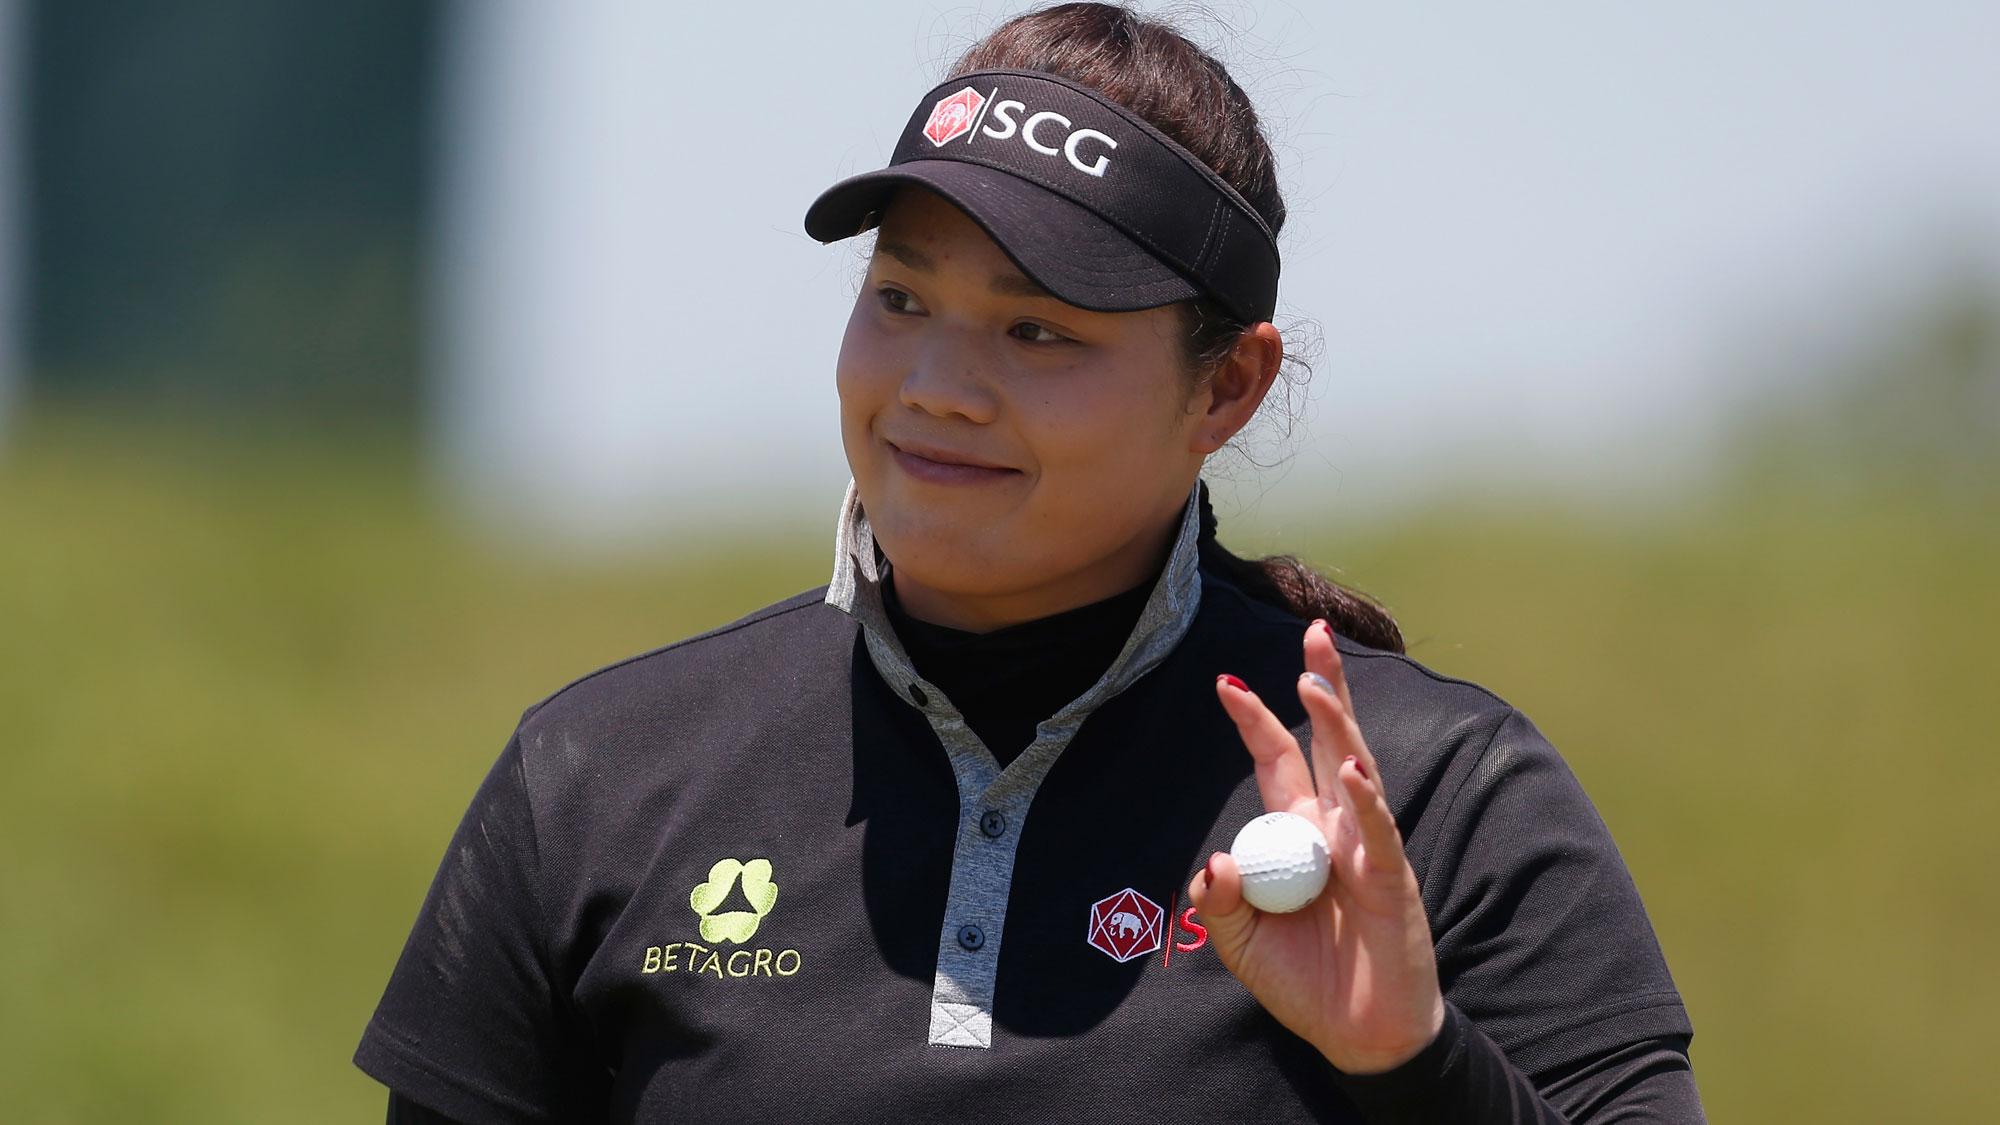 Ariya Jutanugarn Is New World's No. 1